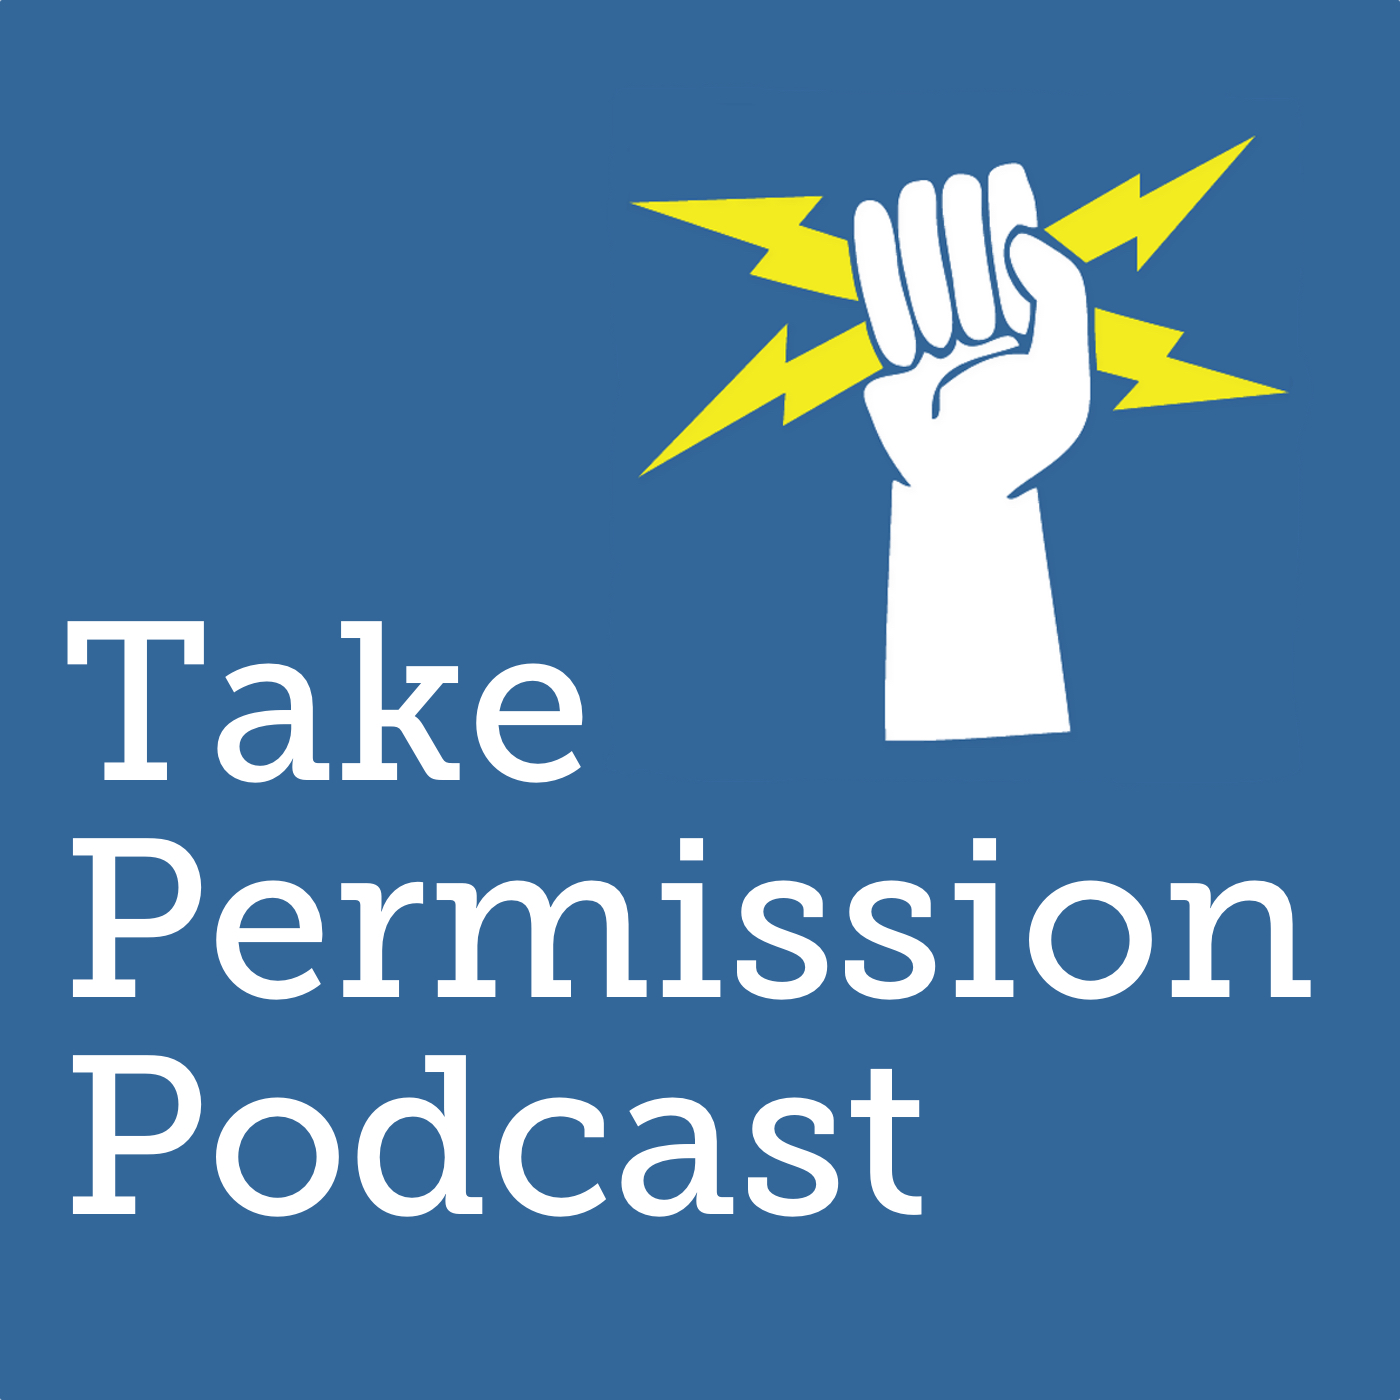 Take Permission Podcast